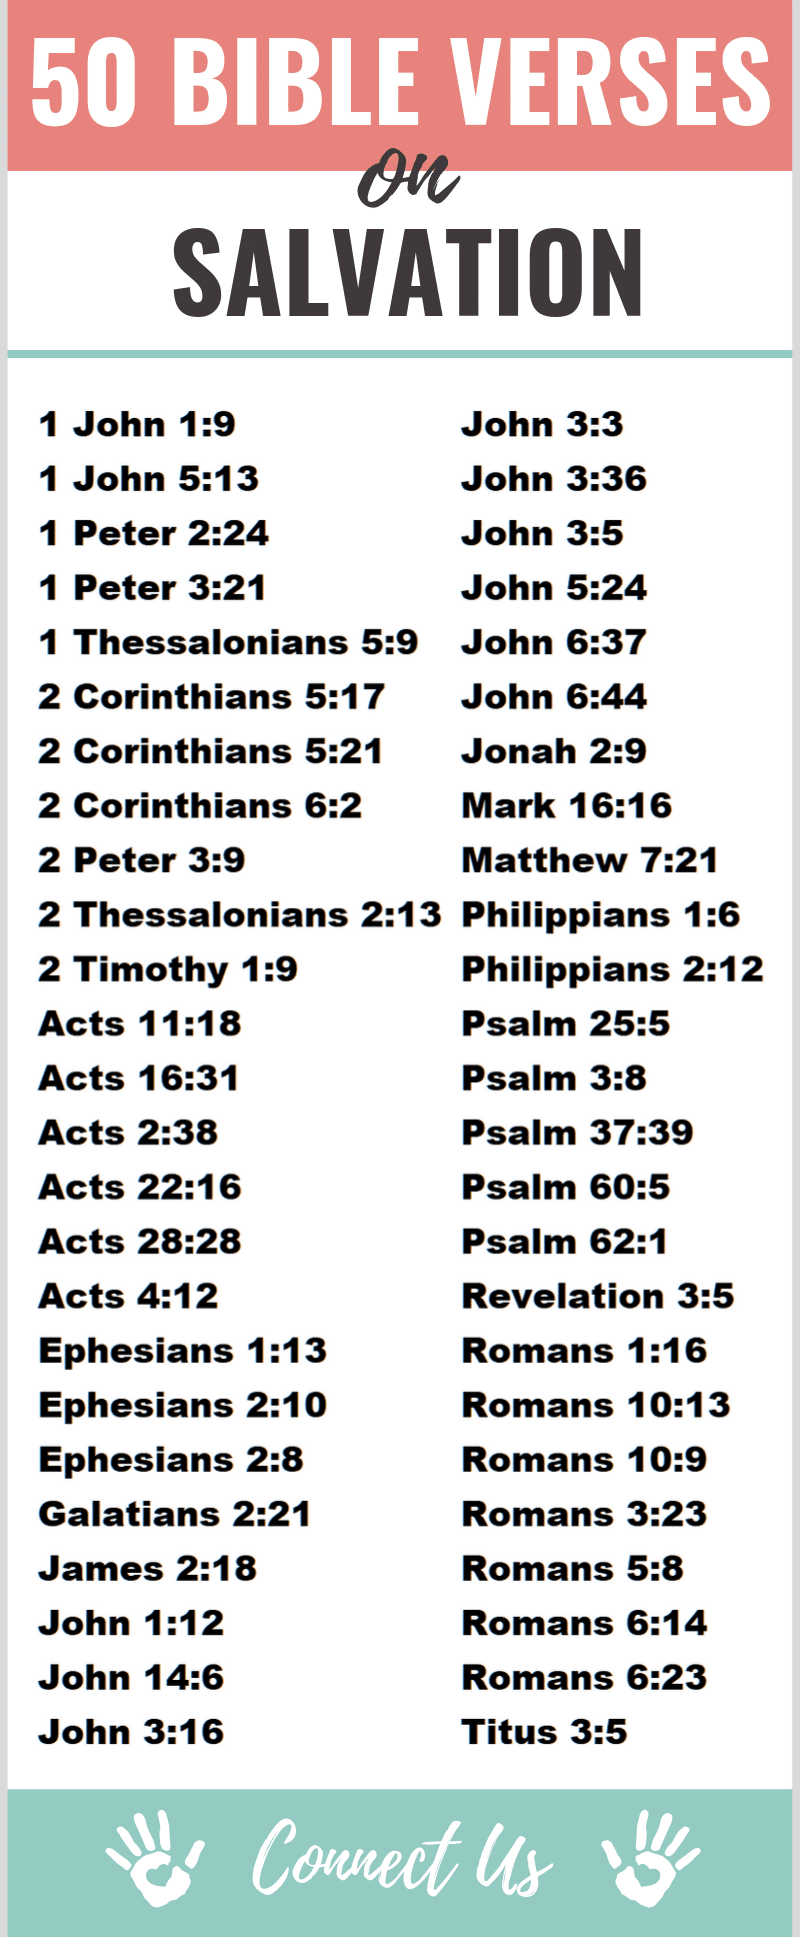 Bible Verses on Salvation